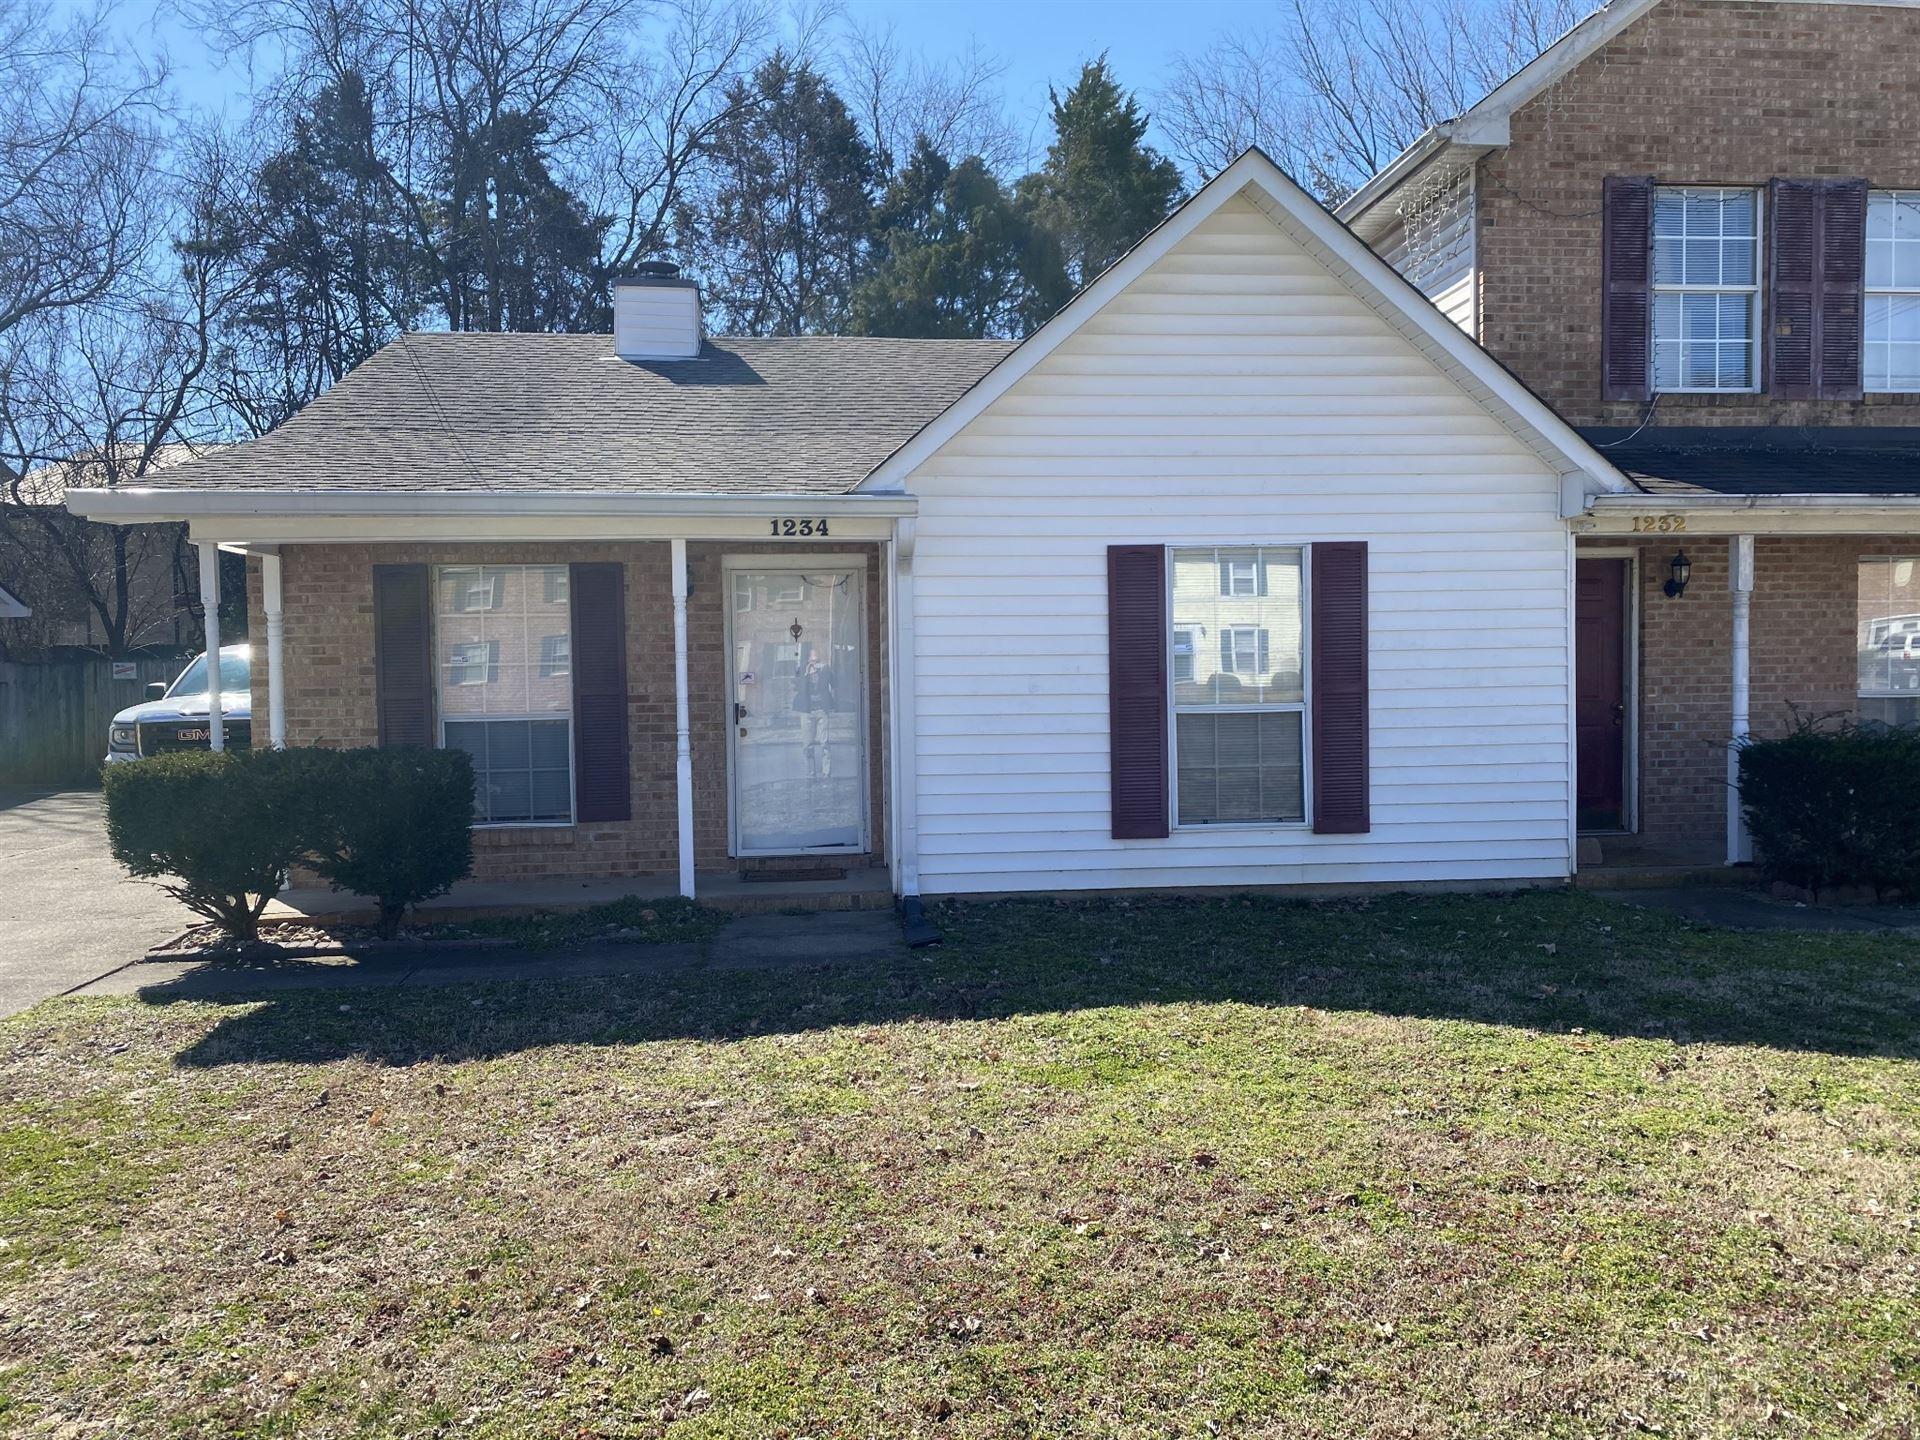 Photo of 1234 Wenlon Dr, Murfreesboro, TN 37130 (MLS # 2231403)